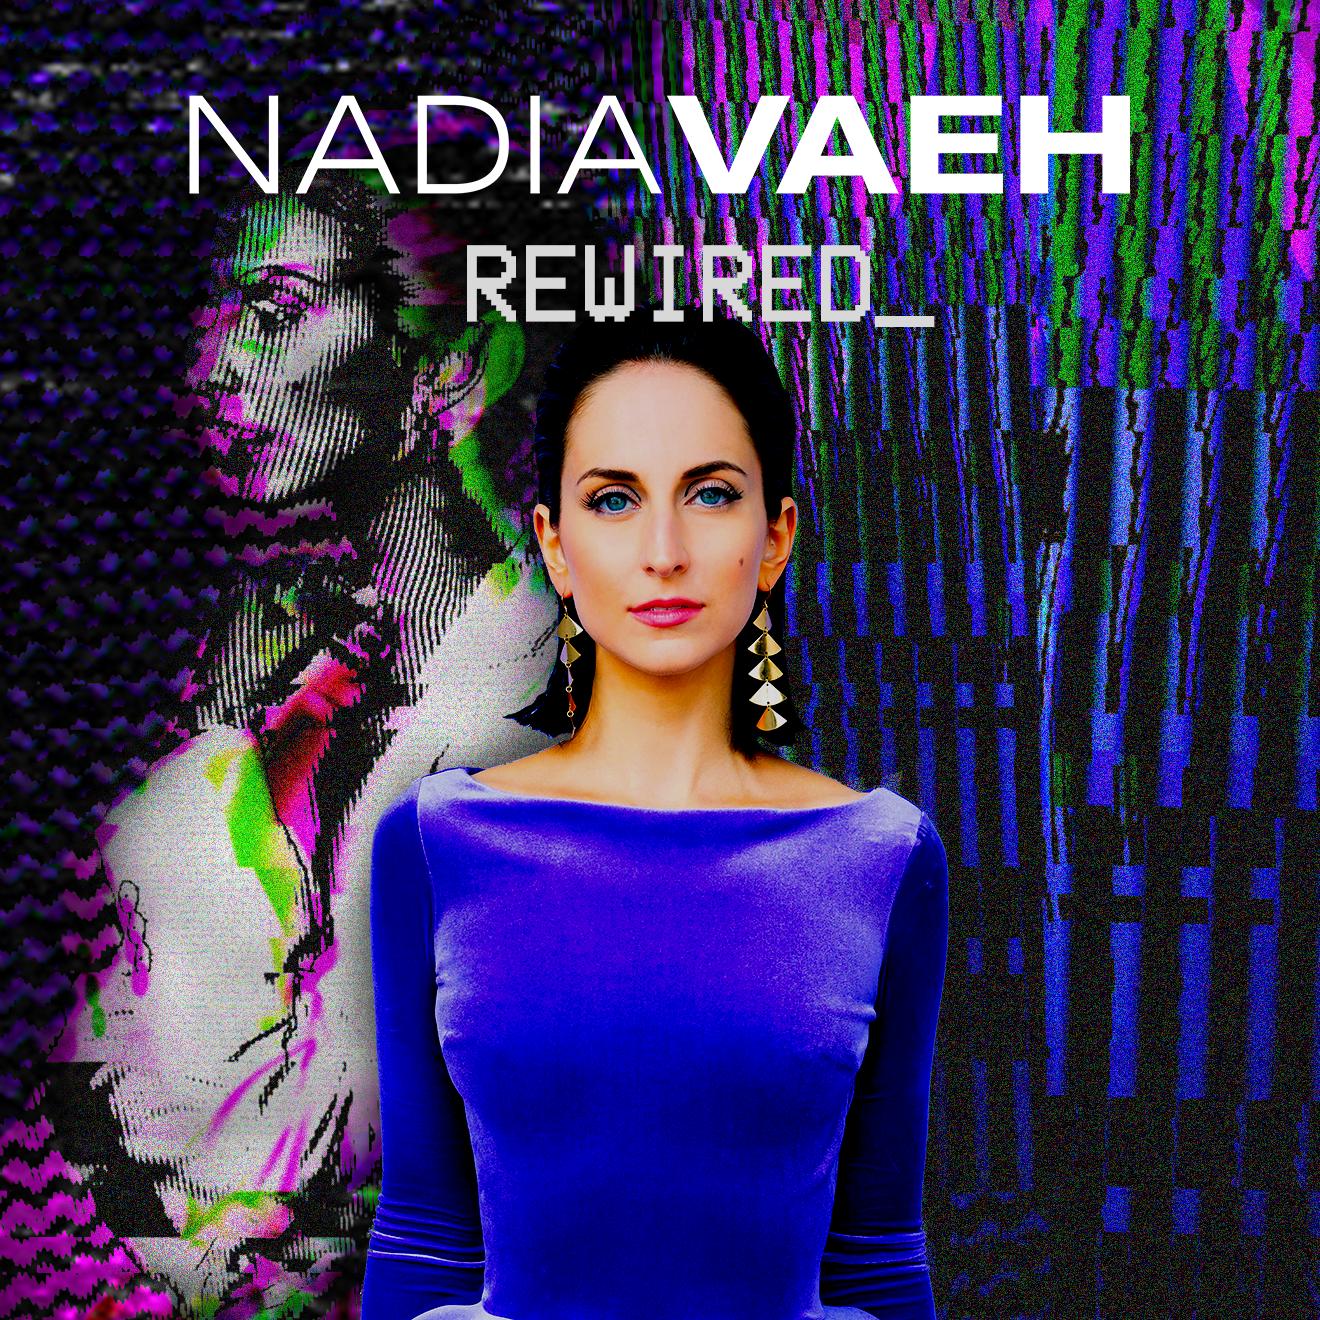 Nadia Vaeh // Boomerang remix by Qubism on .: NOVA MUSIC blog